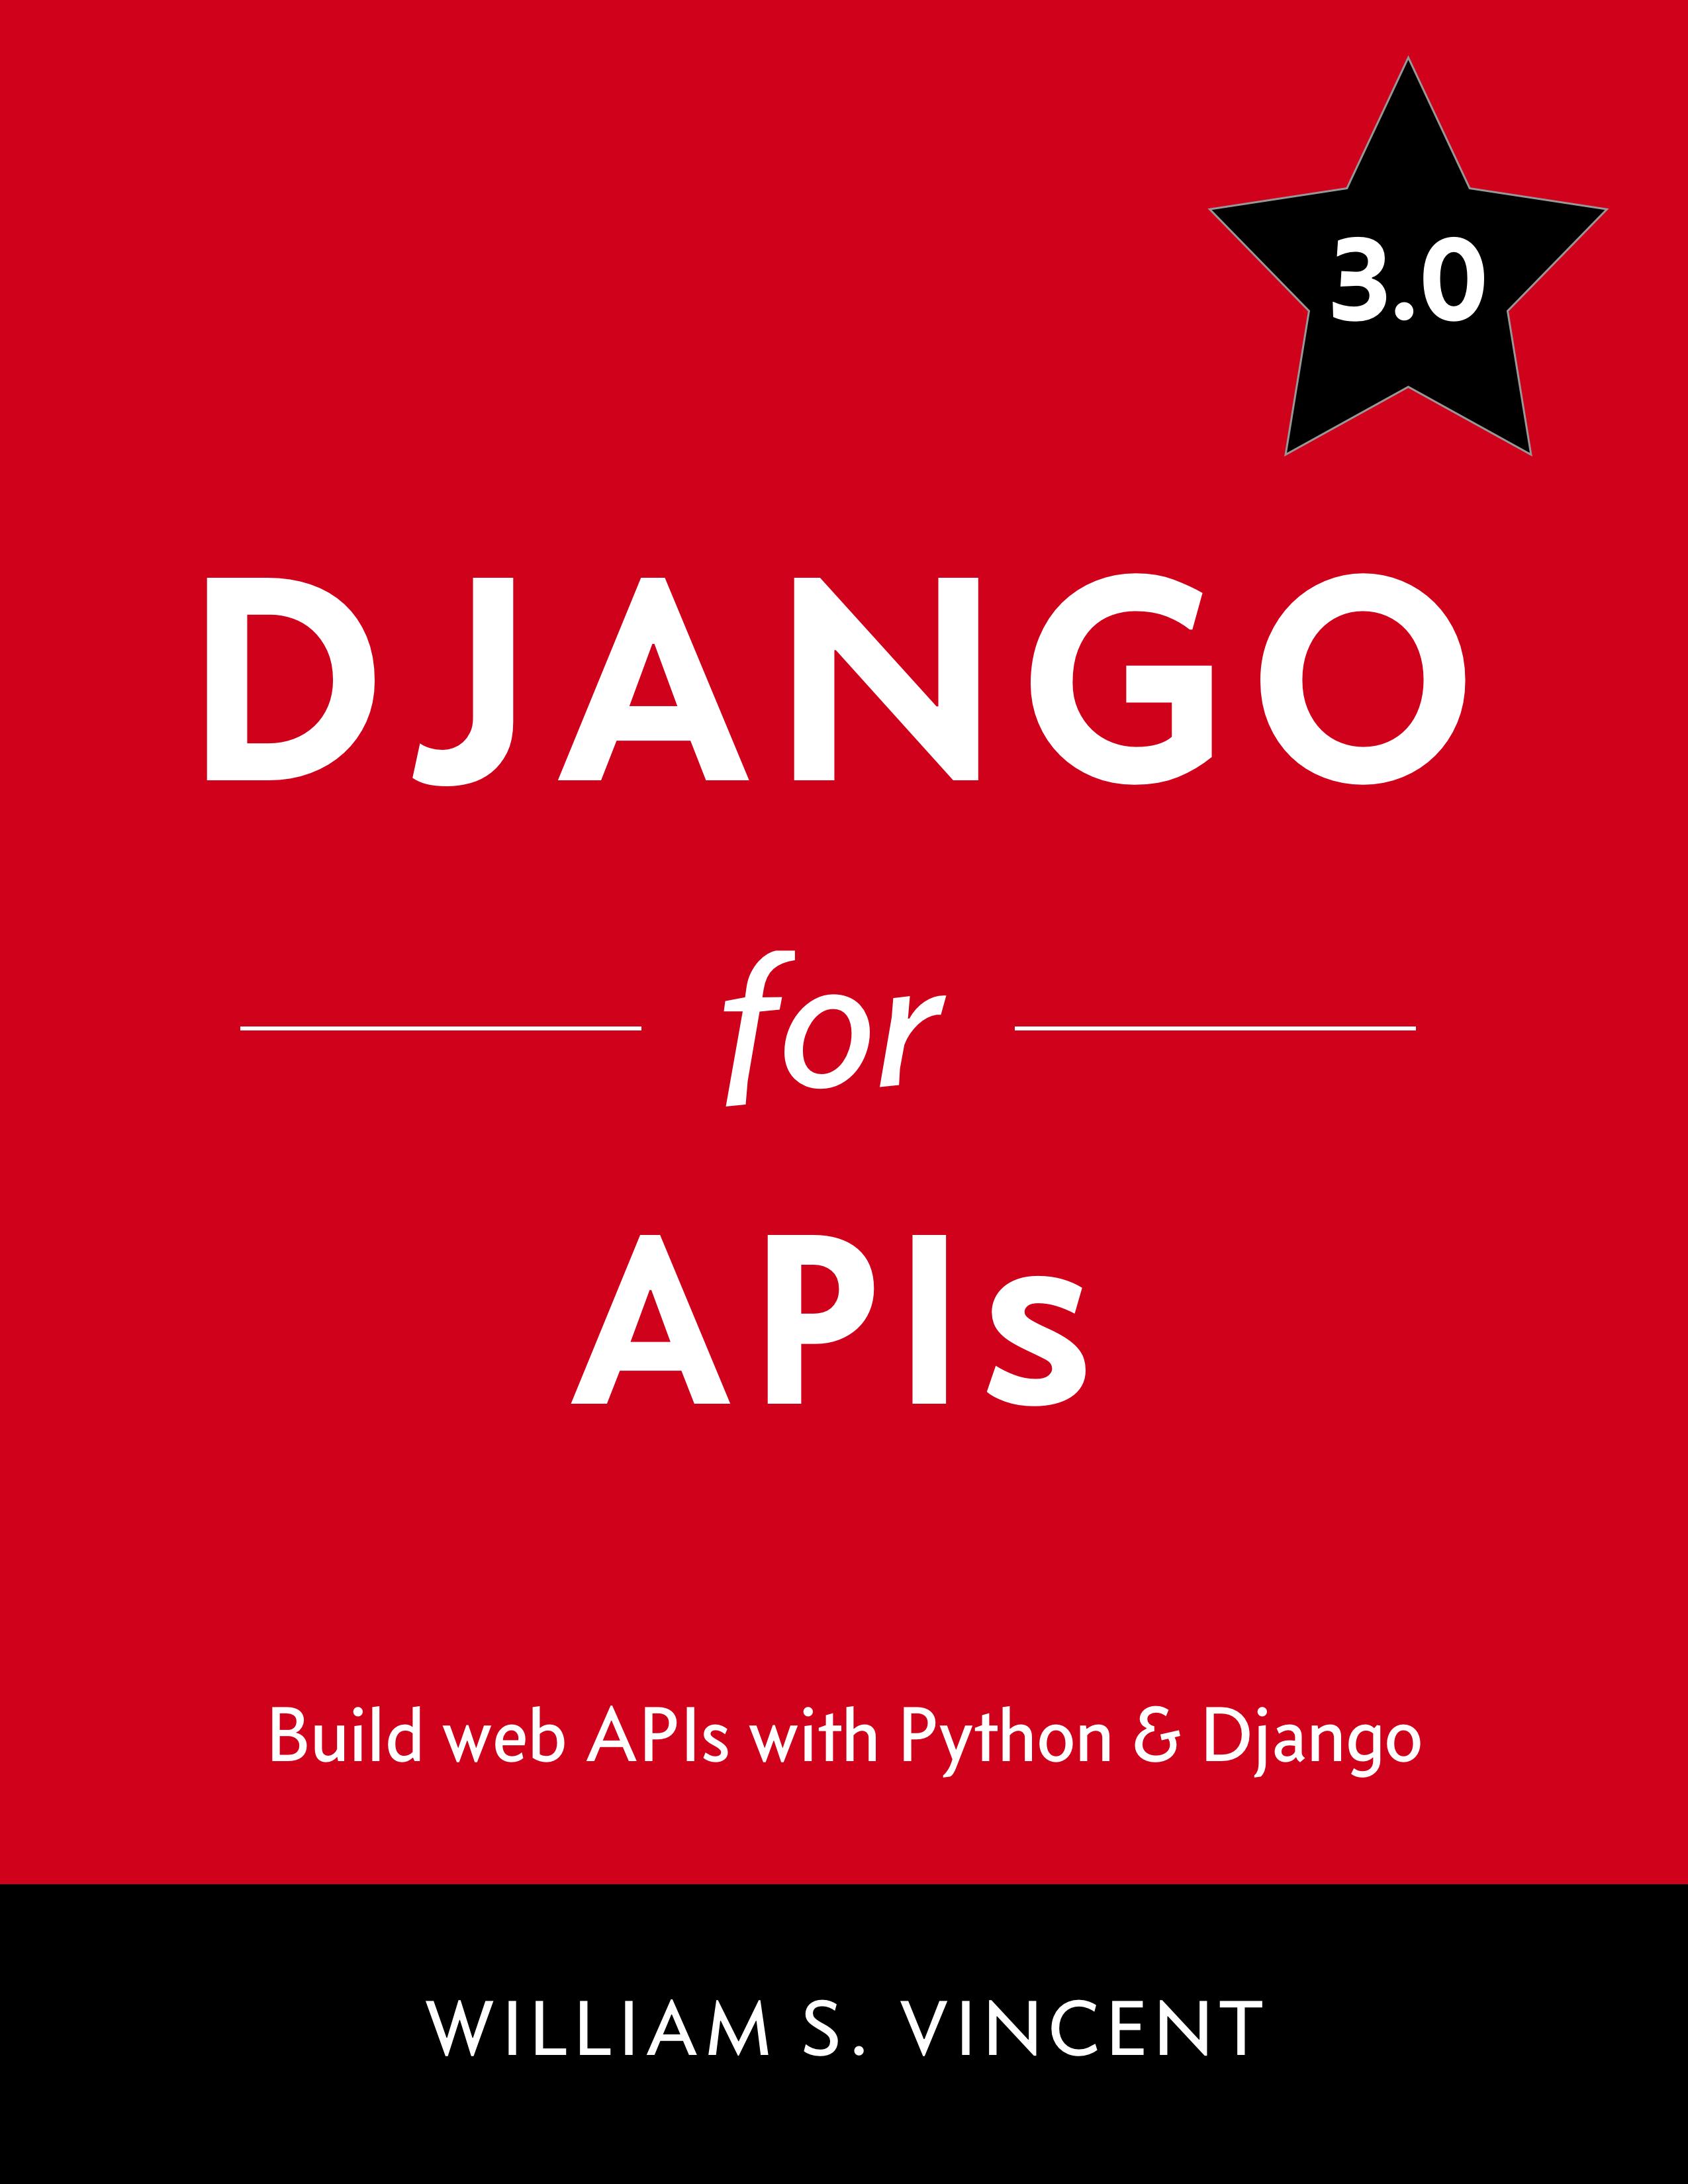 Django for APIs book cover